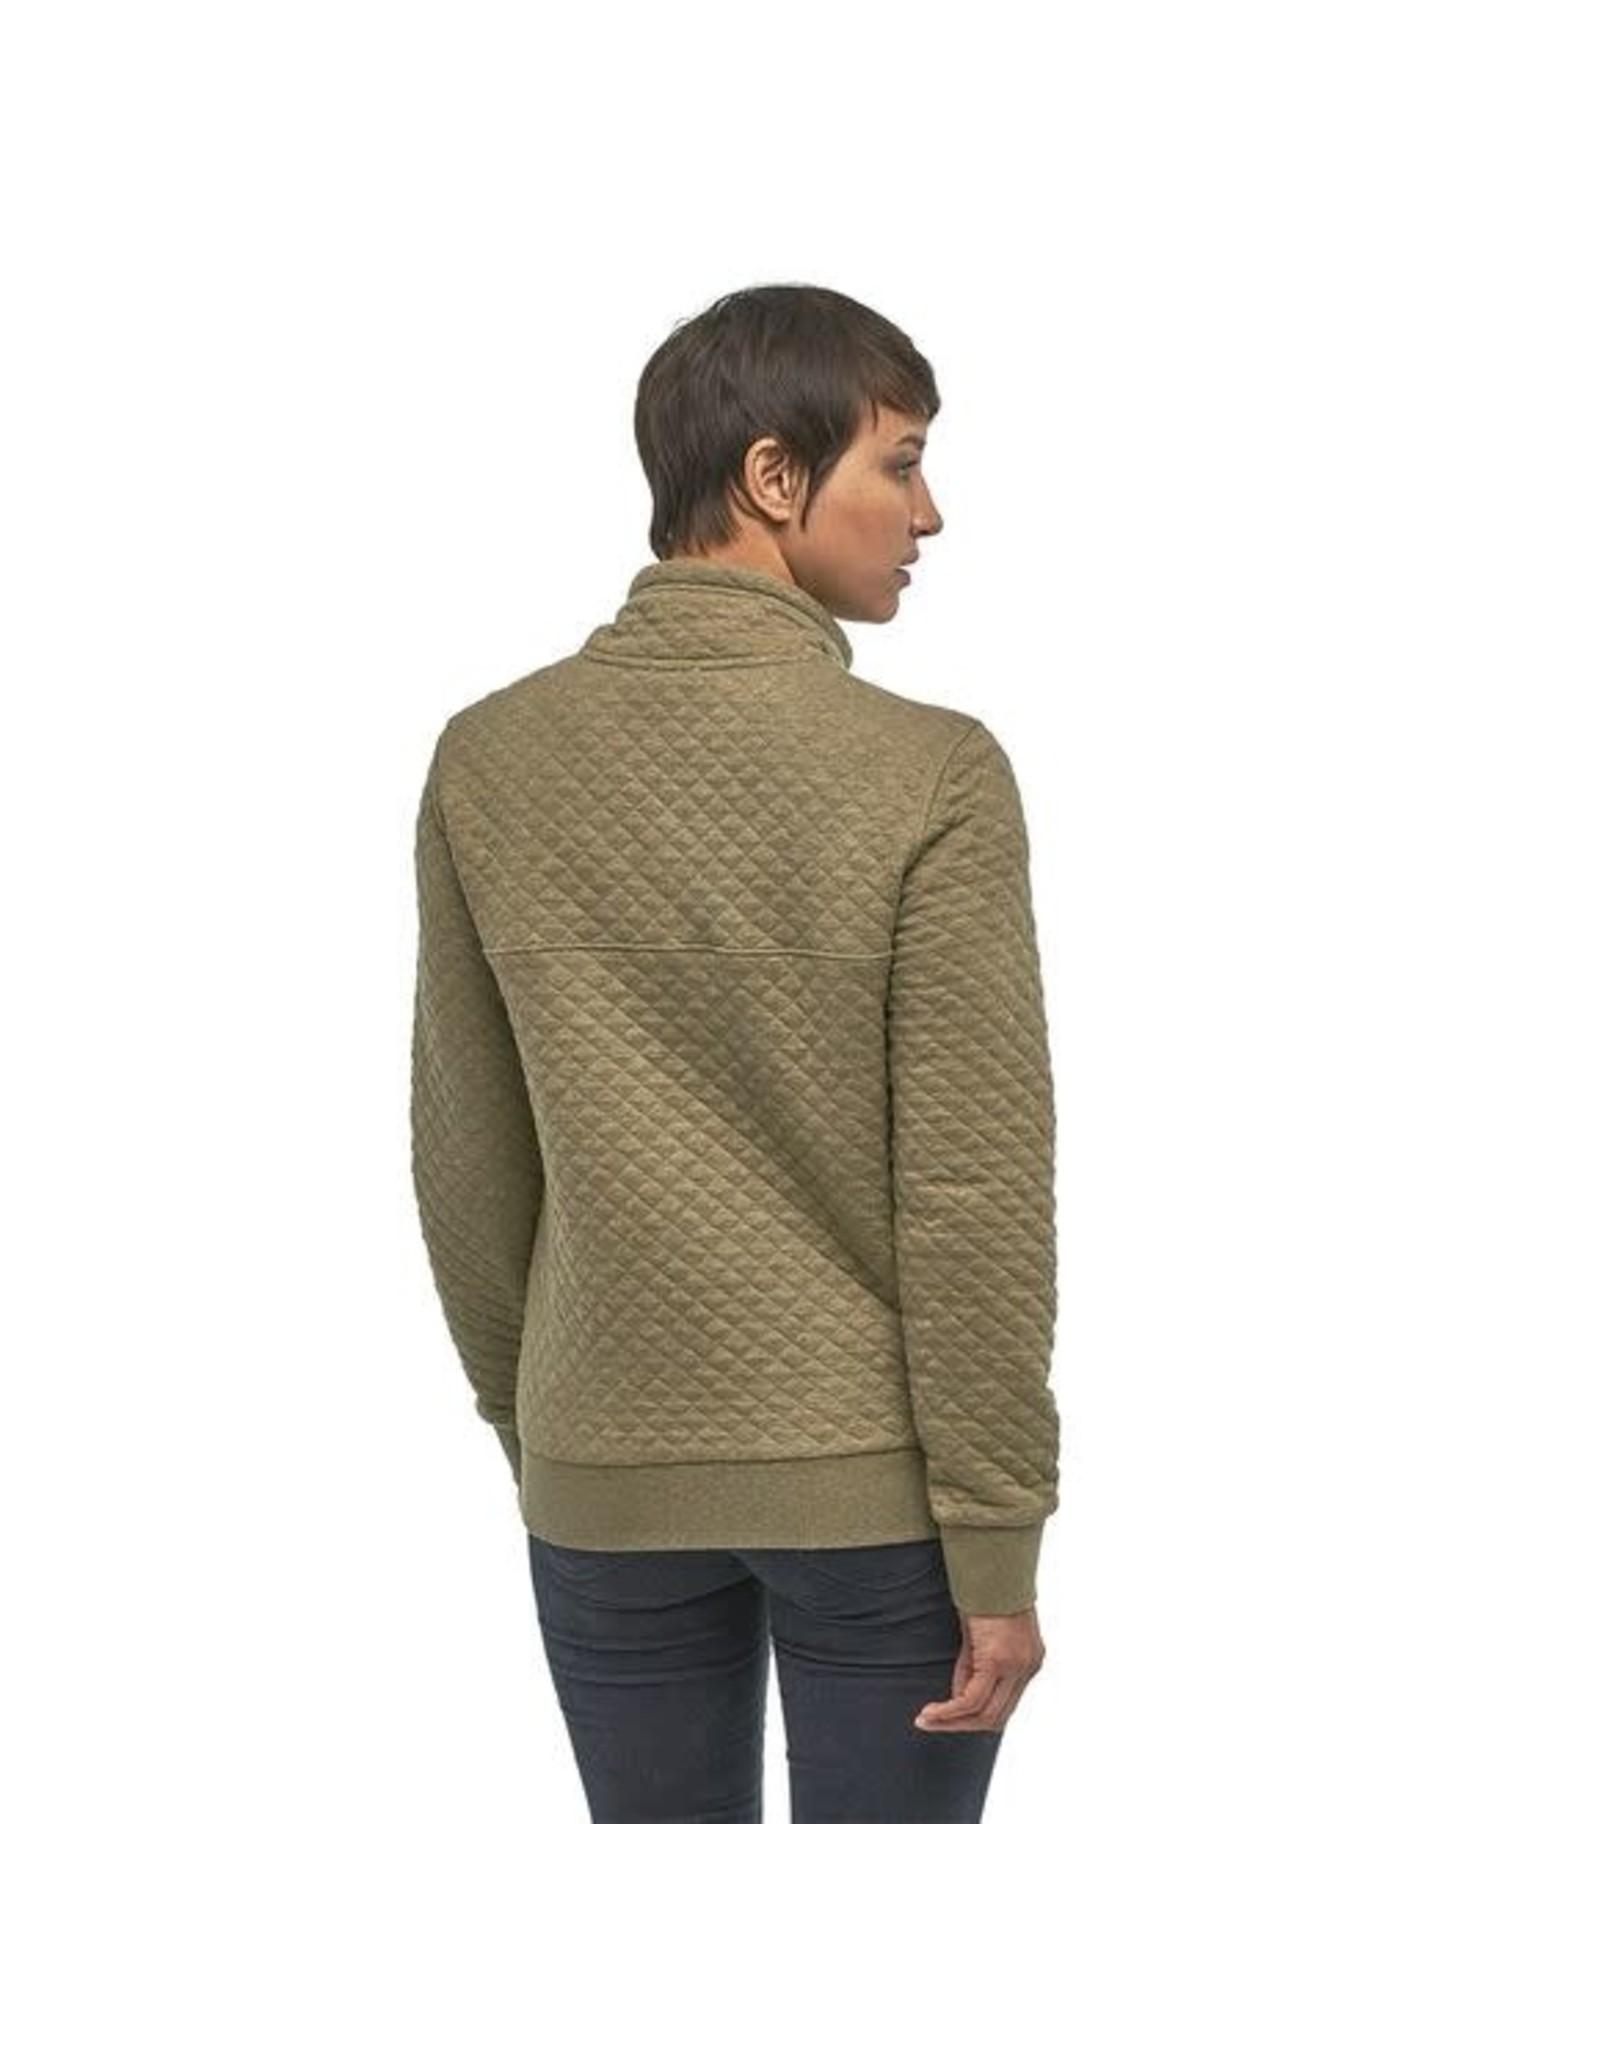 Patagonia W's Organic Cotton Quilt Snap-T P/O - Sage Khaki